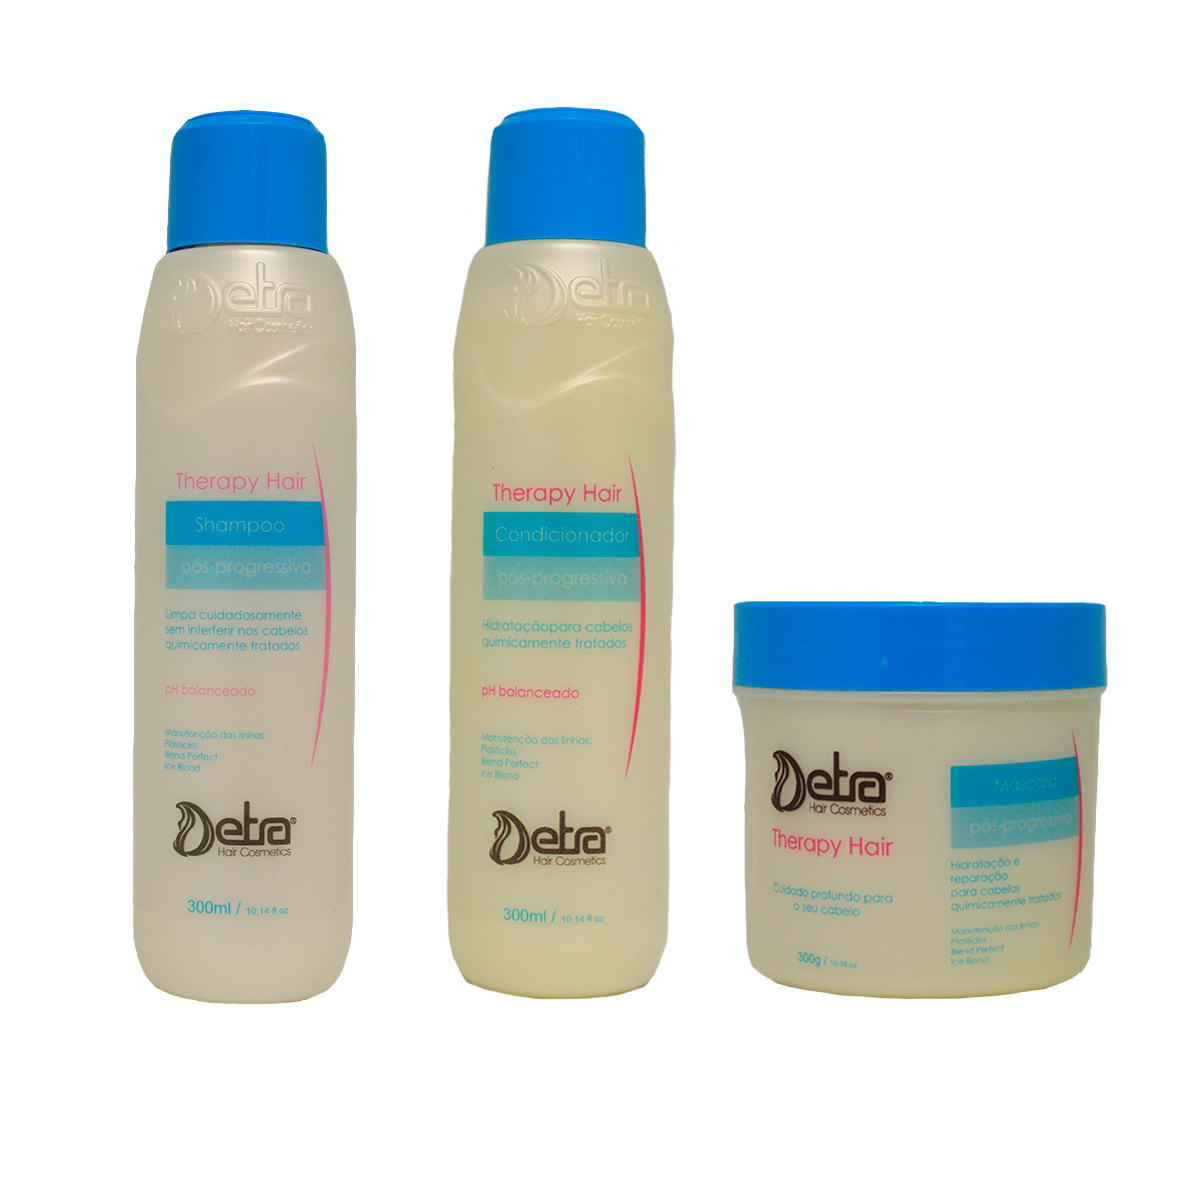 Detra Hair cosmeticos  kit Capilar Pós Progressiva  Therapy Hair